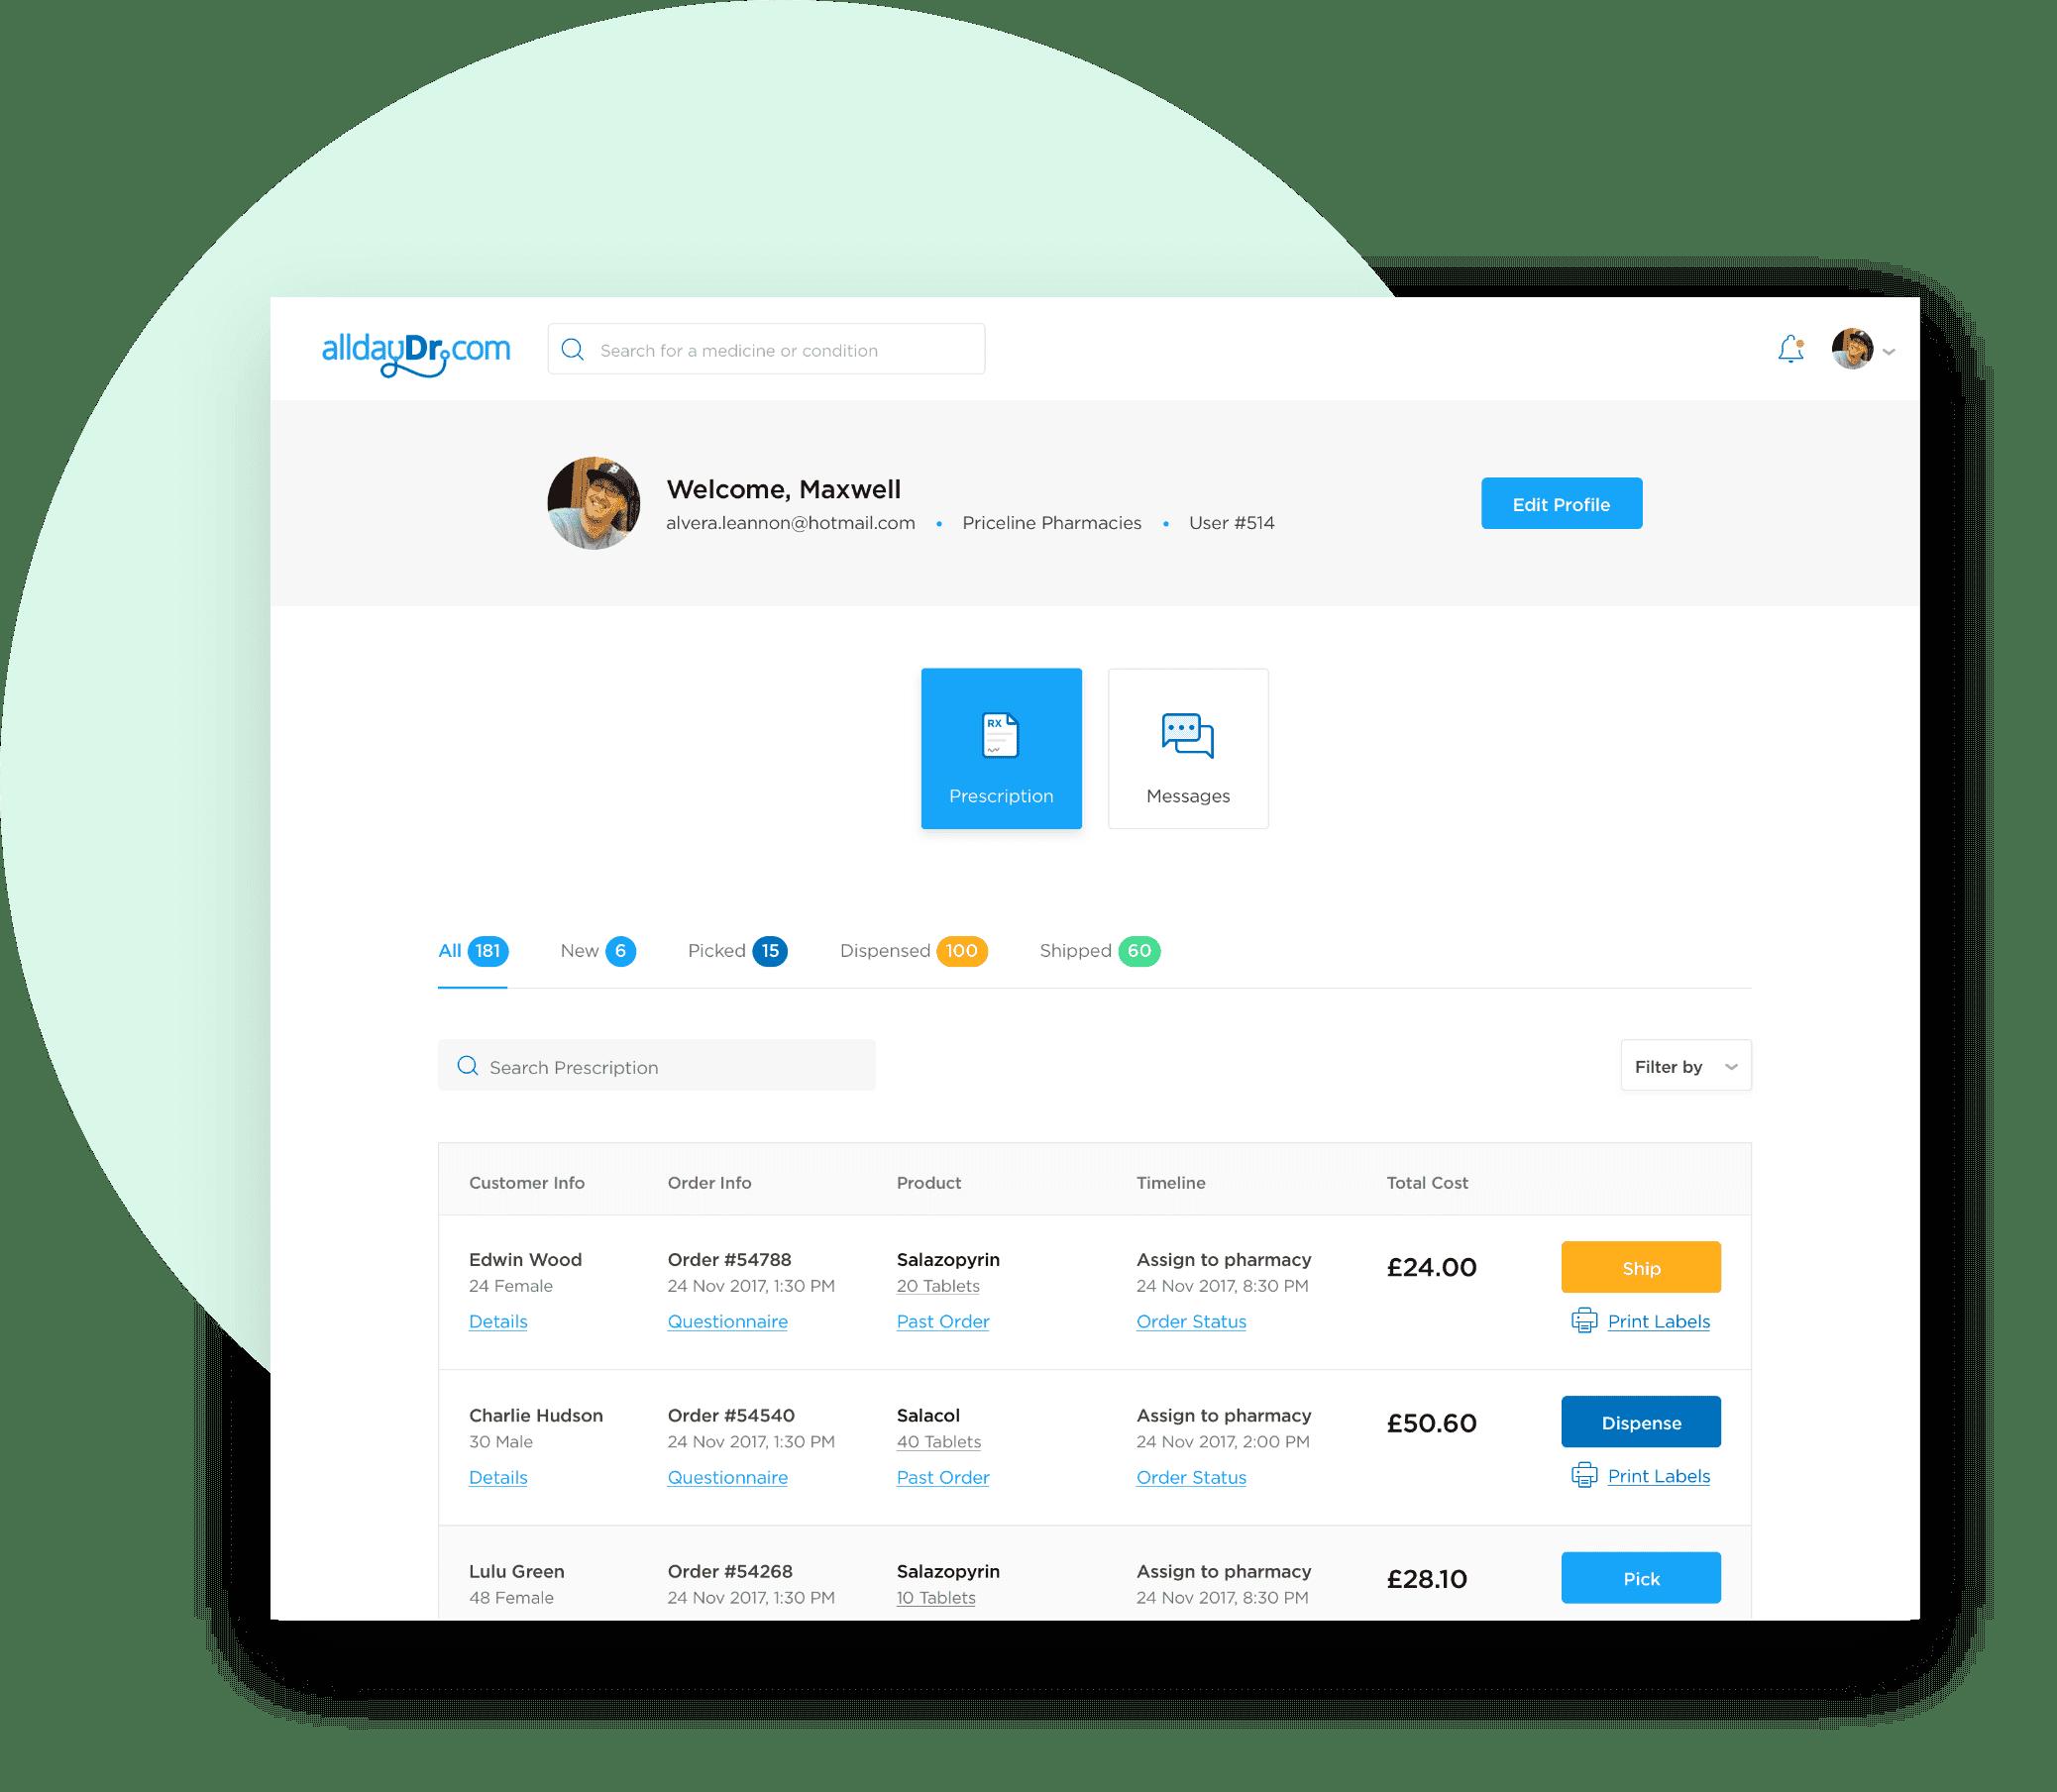 alldayDr Pharmacy portal